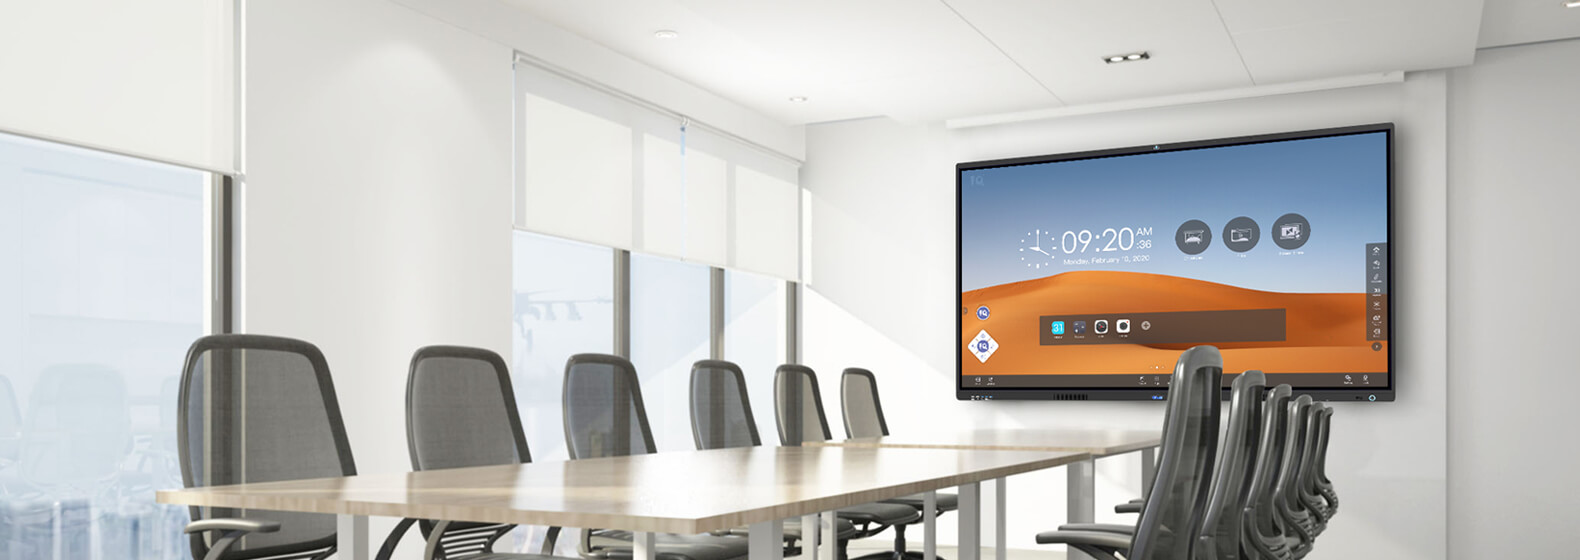 IQ Smart Meeting Room Solutions